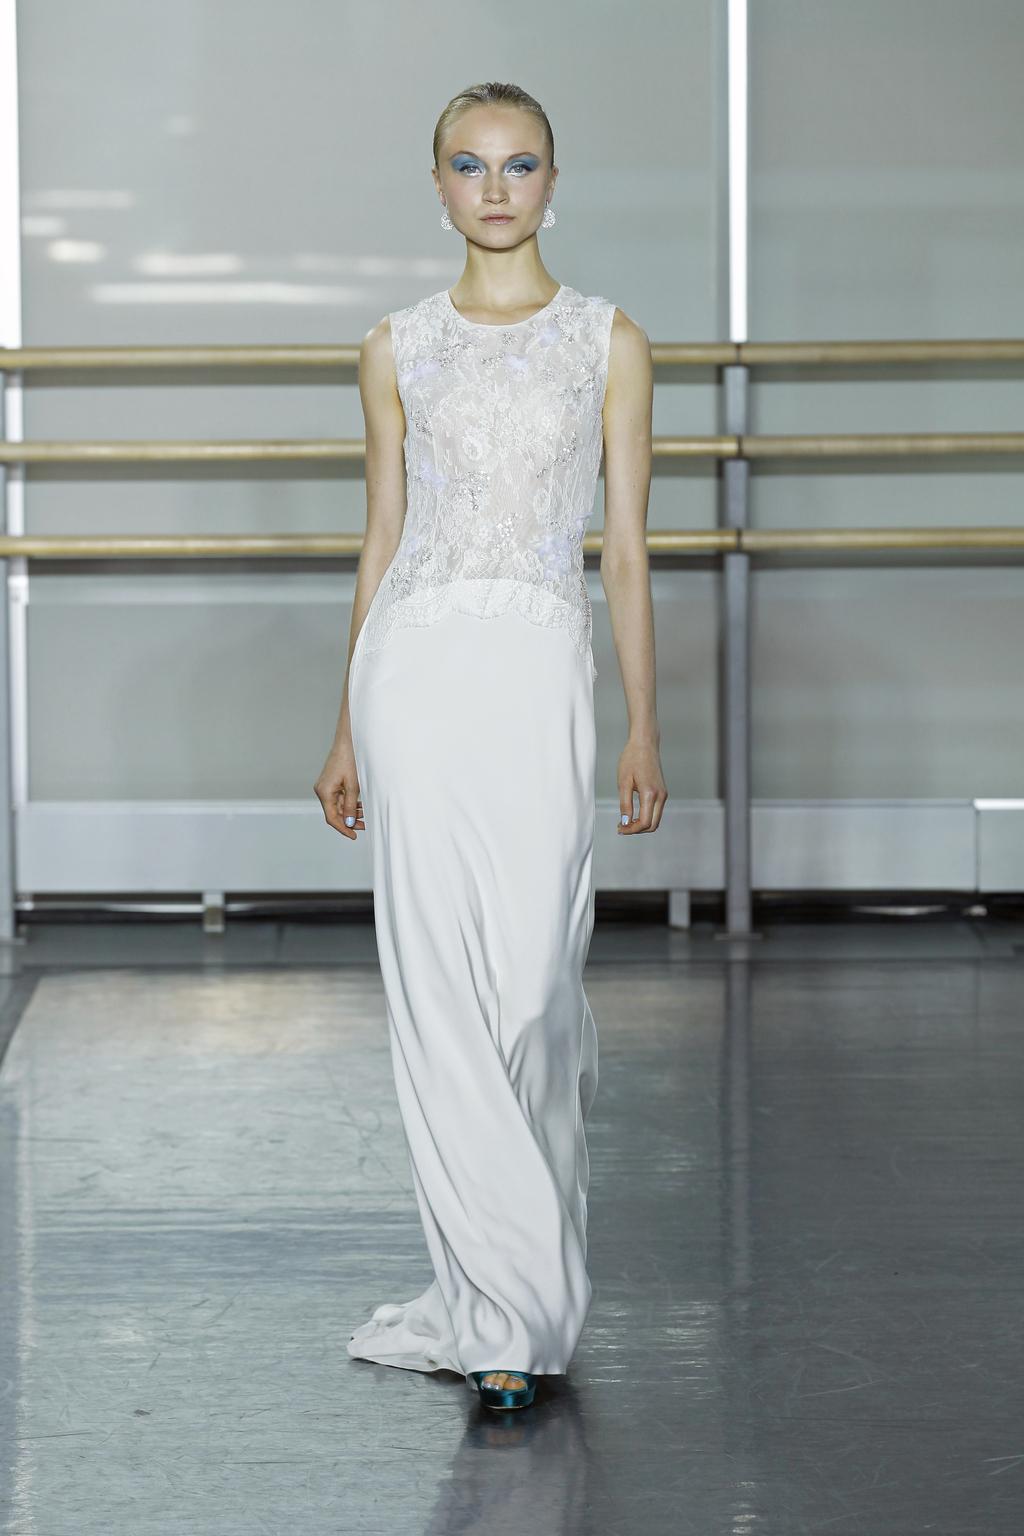 Rivini-wedding-dress-fall-2013-bridal-gown-natalya.full